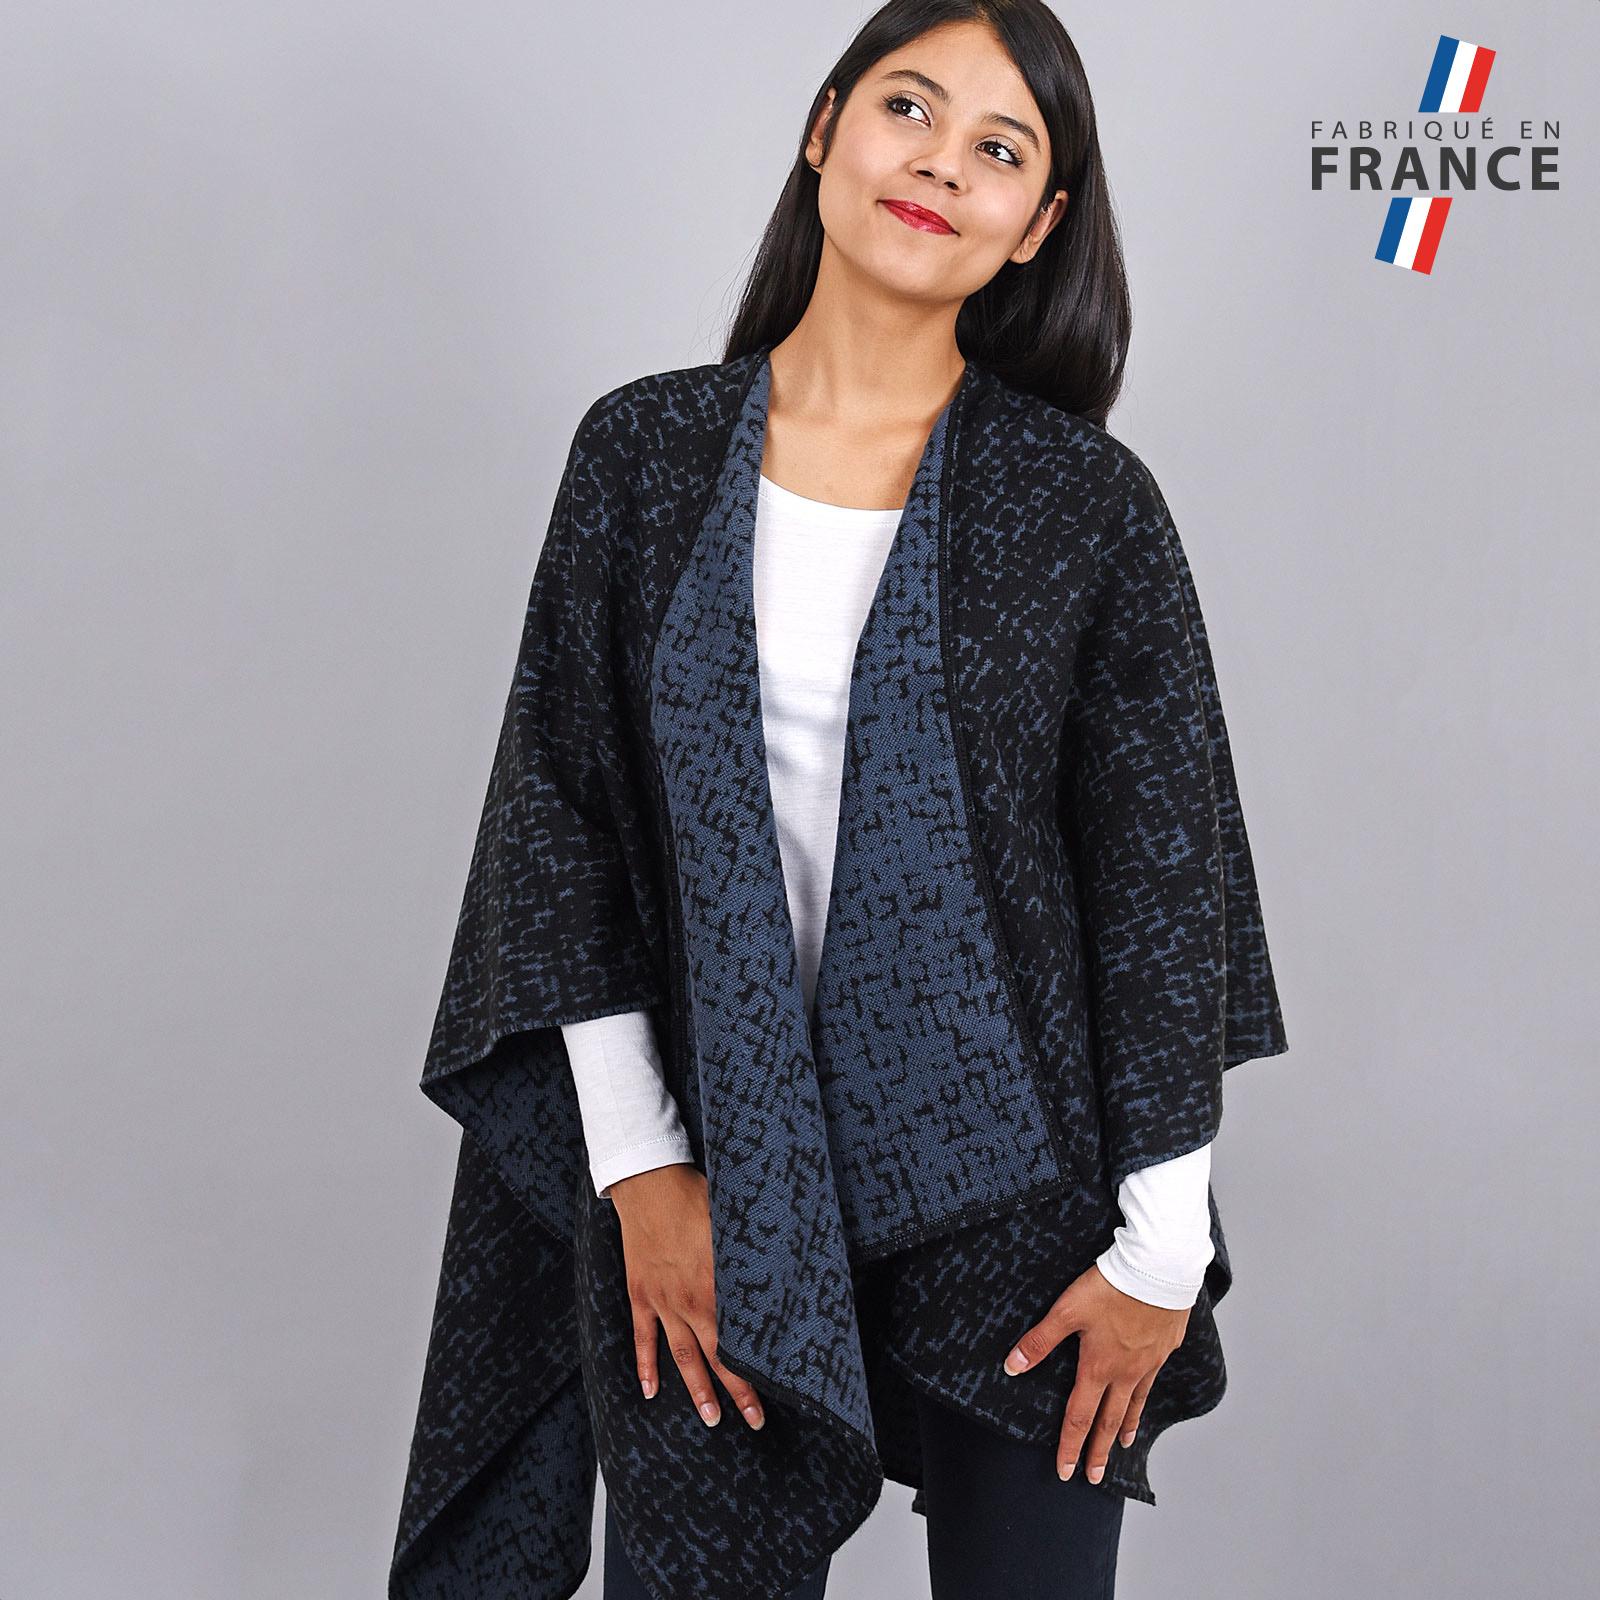 AT-03957-VF16-FR-poncho-femme-bleu